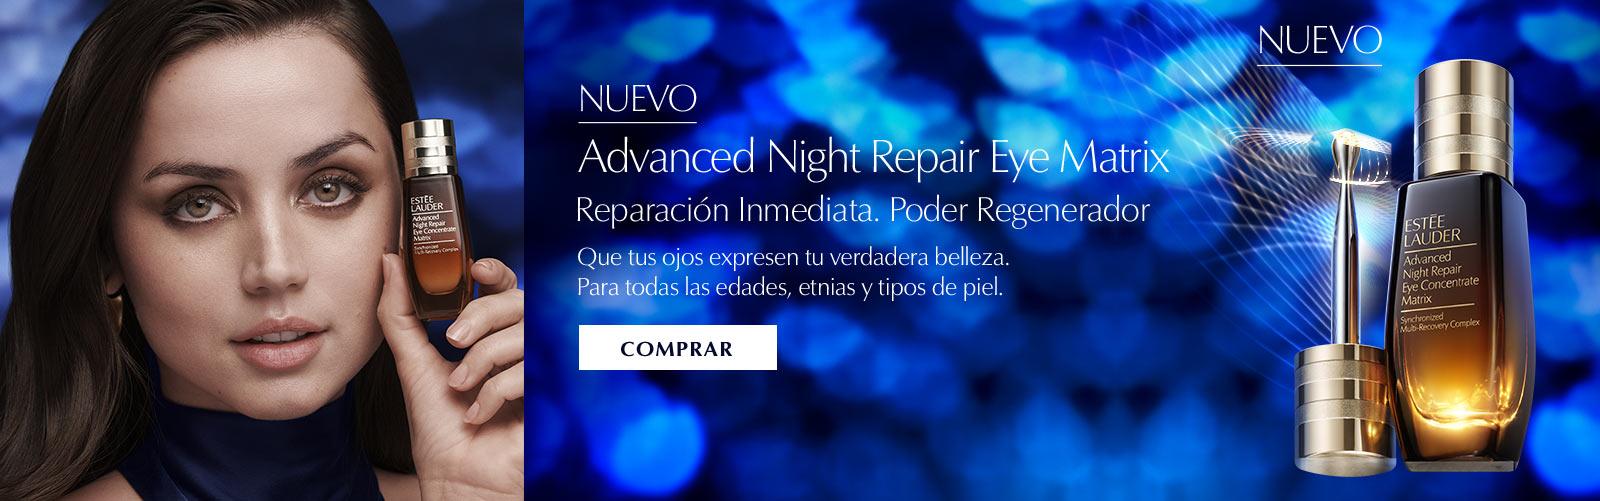 Estée Lauder Advanced Night Repair Eye 360 Matrix